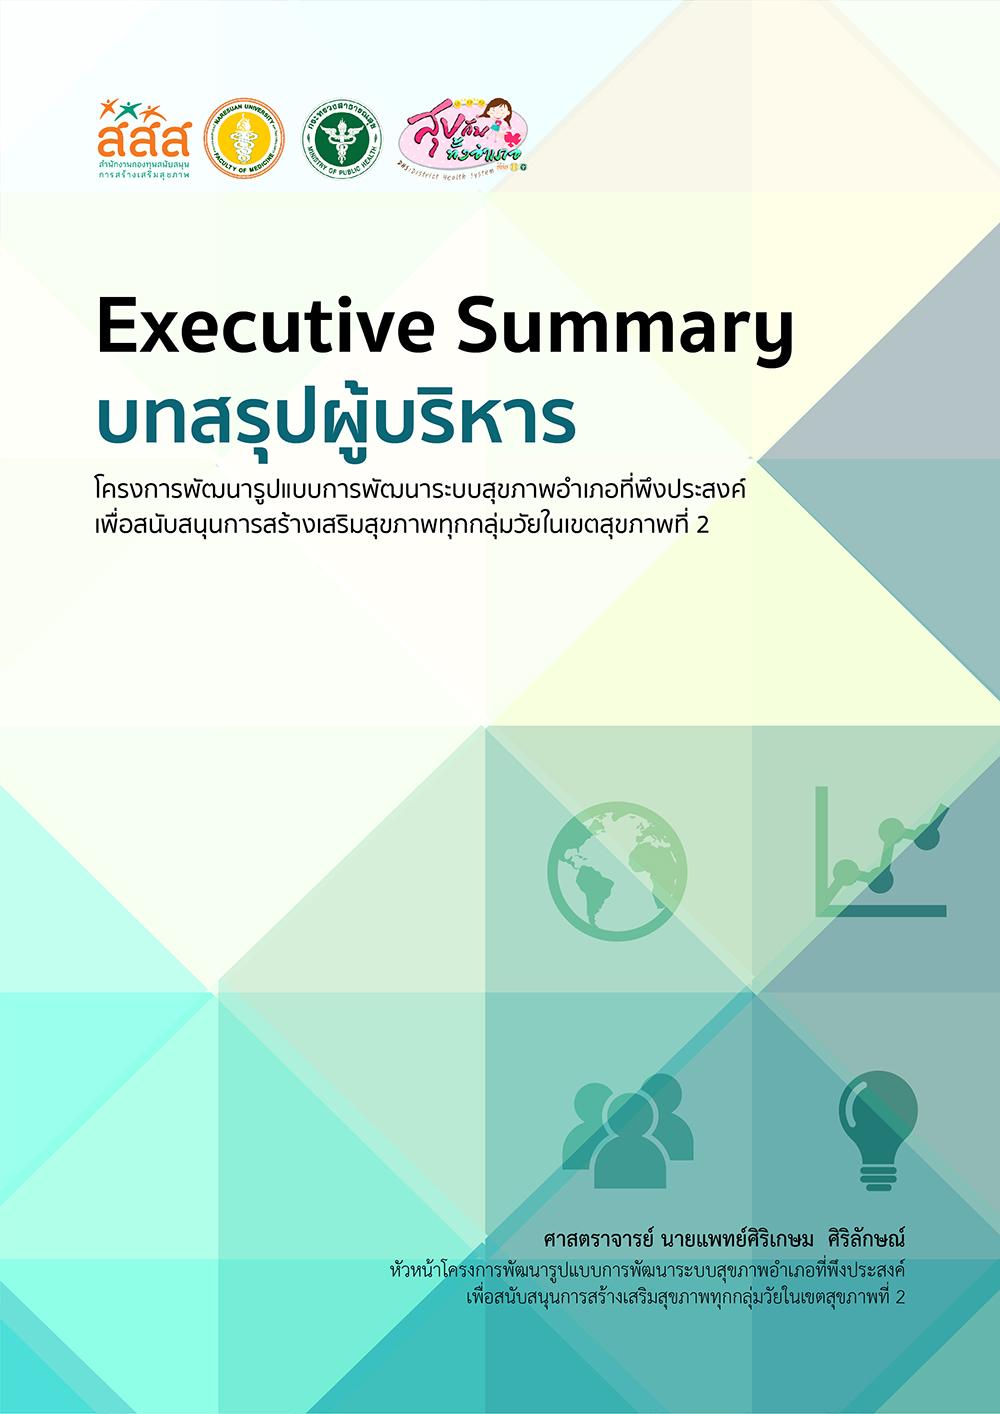 Executive Summary บทสรุปผู้บริหาร